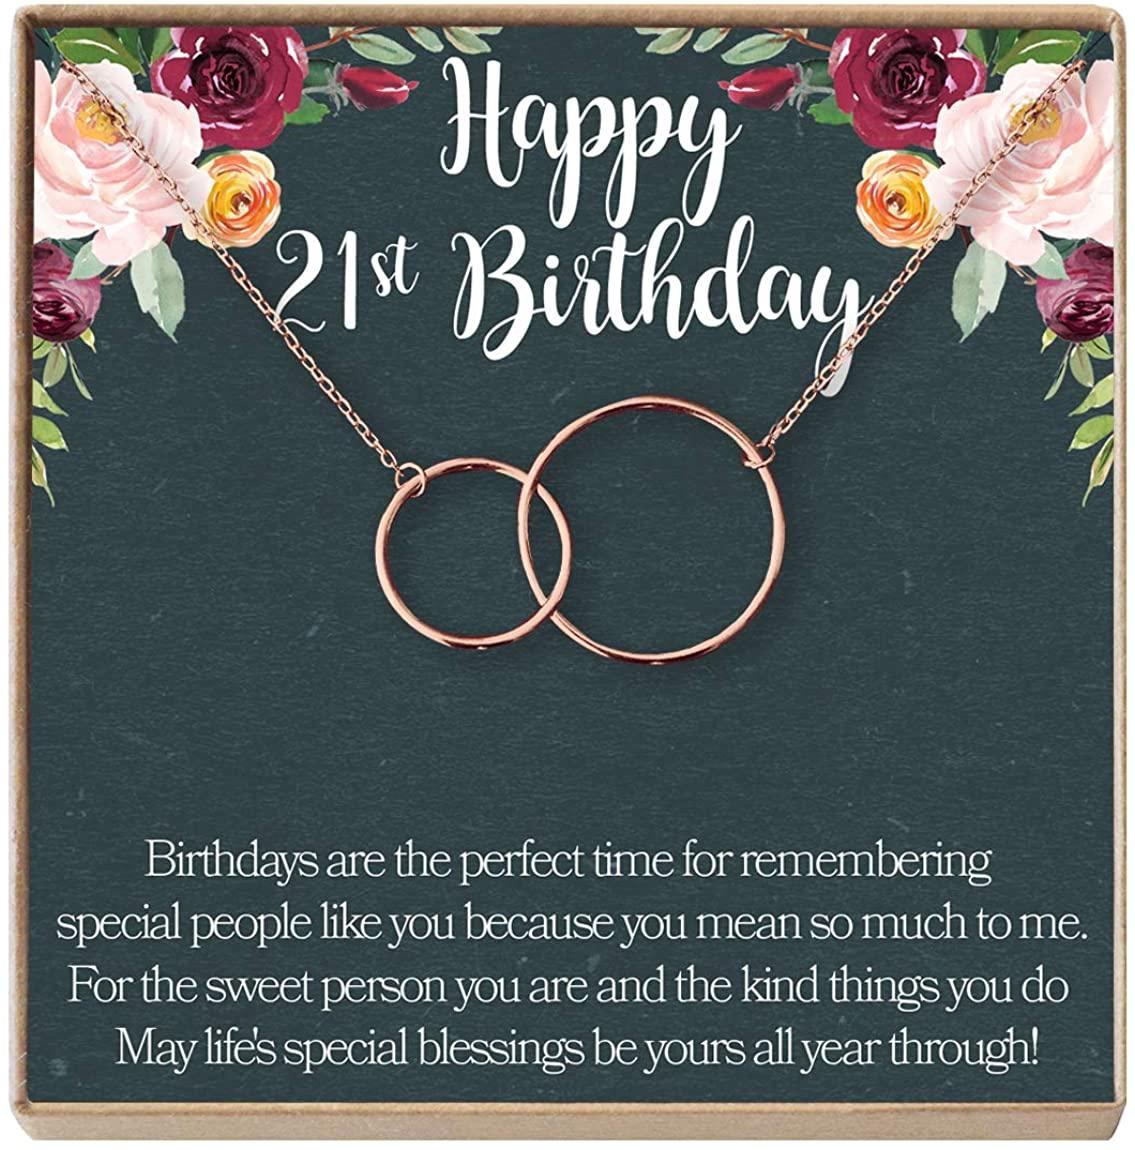 Dear Ava 21st Birthday Gift Necklace: Birthday Gift, Jewlery Gift for Her, 2 Interlocking Circles